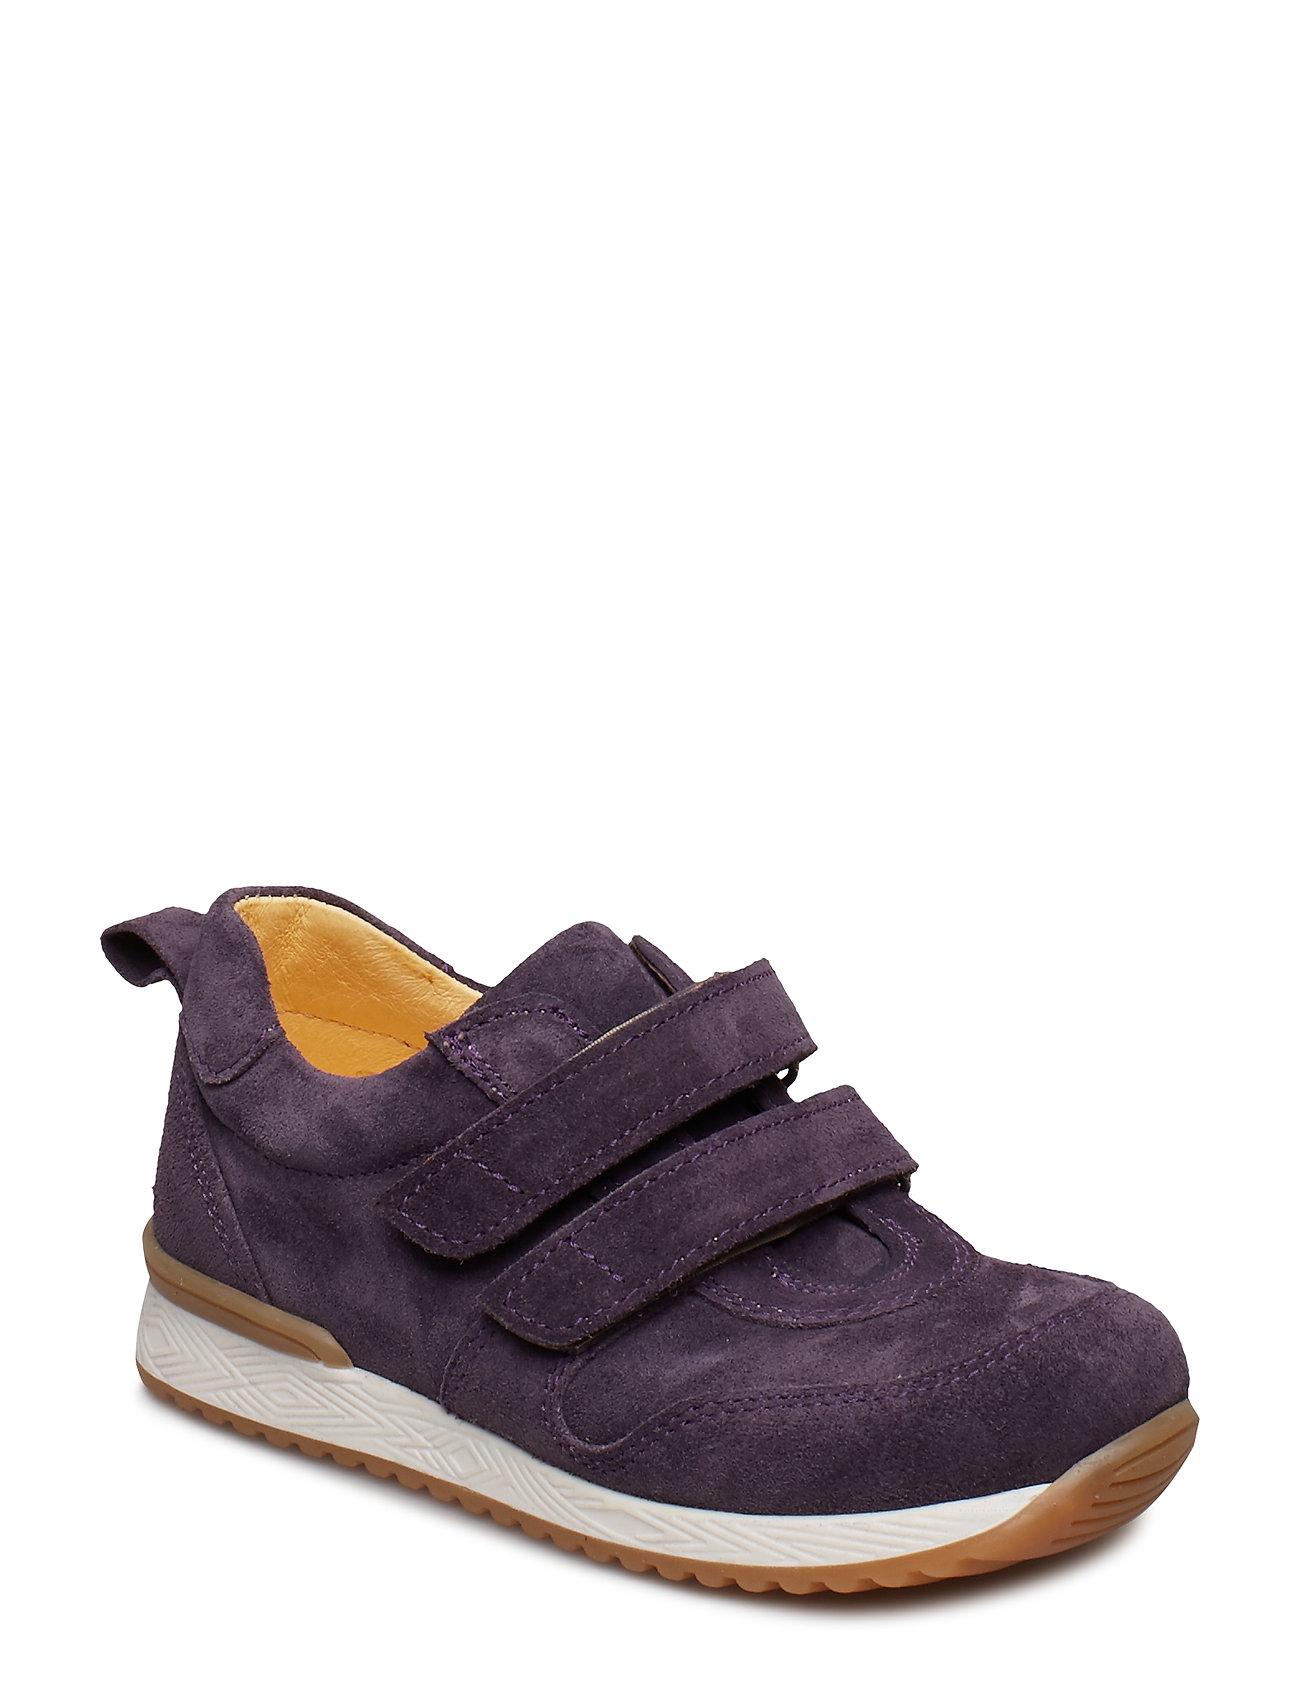 ANGULUS Shoes - flat - with velcro - 2203 DARK PURPLE